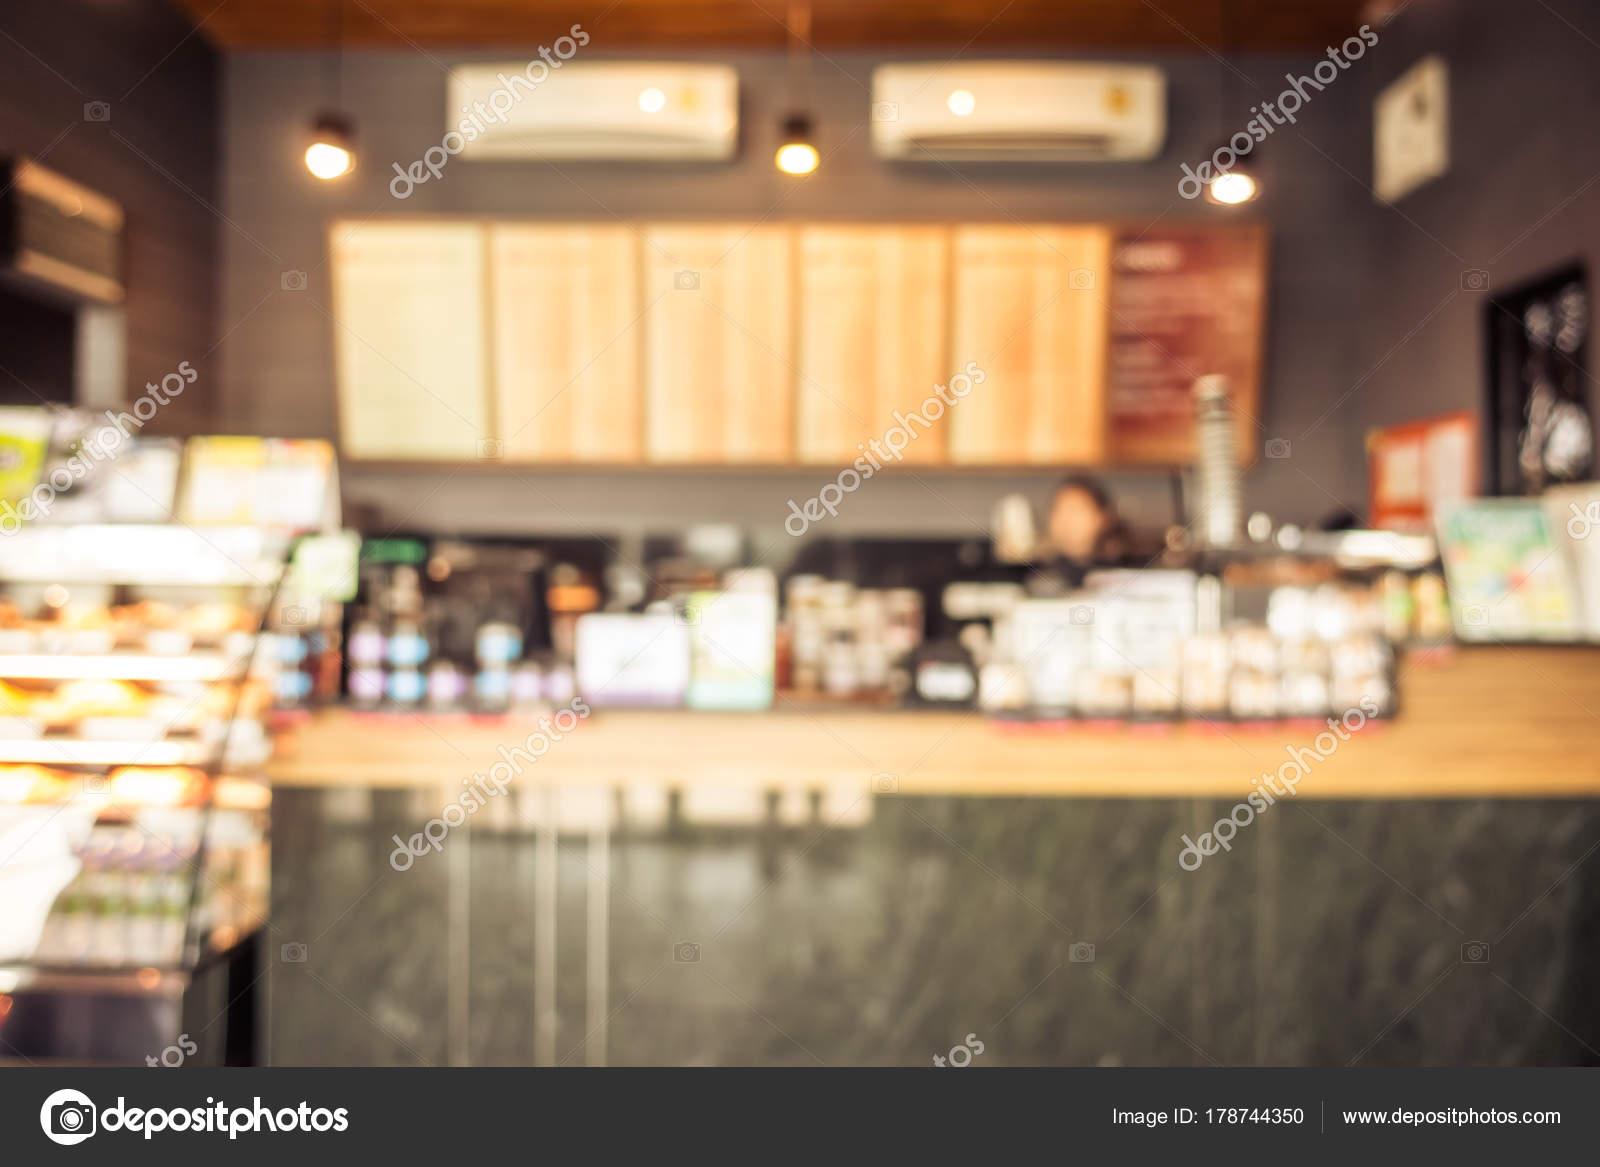 Abstract Blur Defocused Coffee Shop Cafe Restaurant Interior